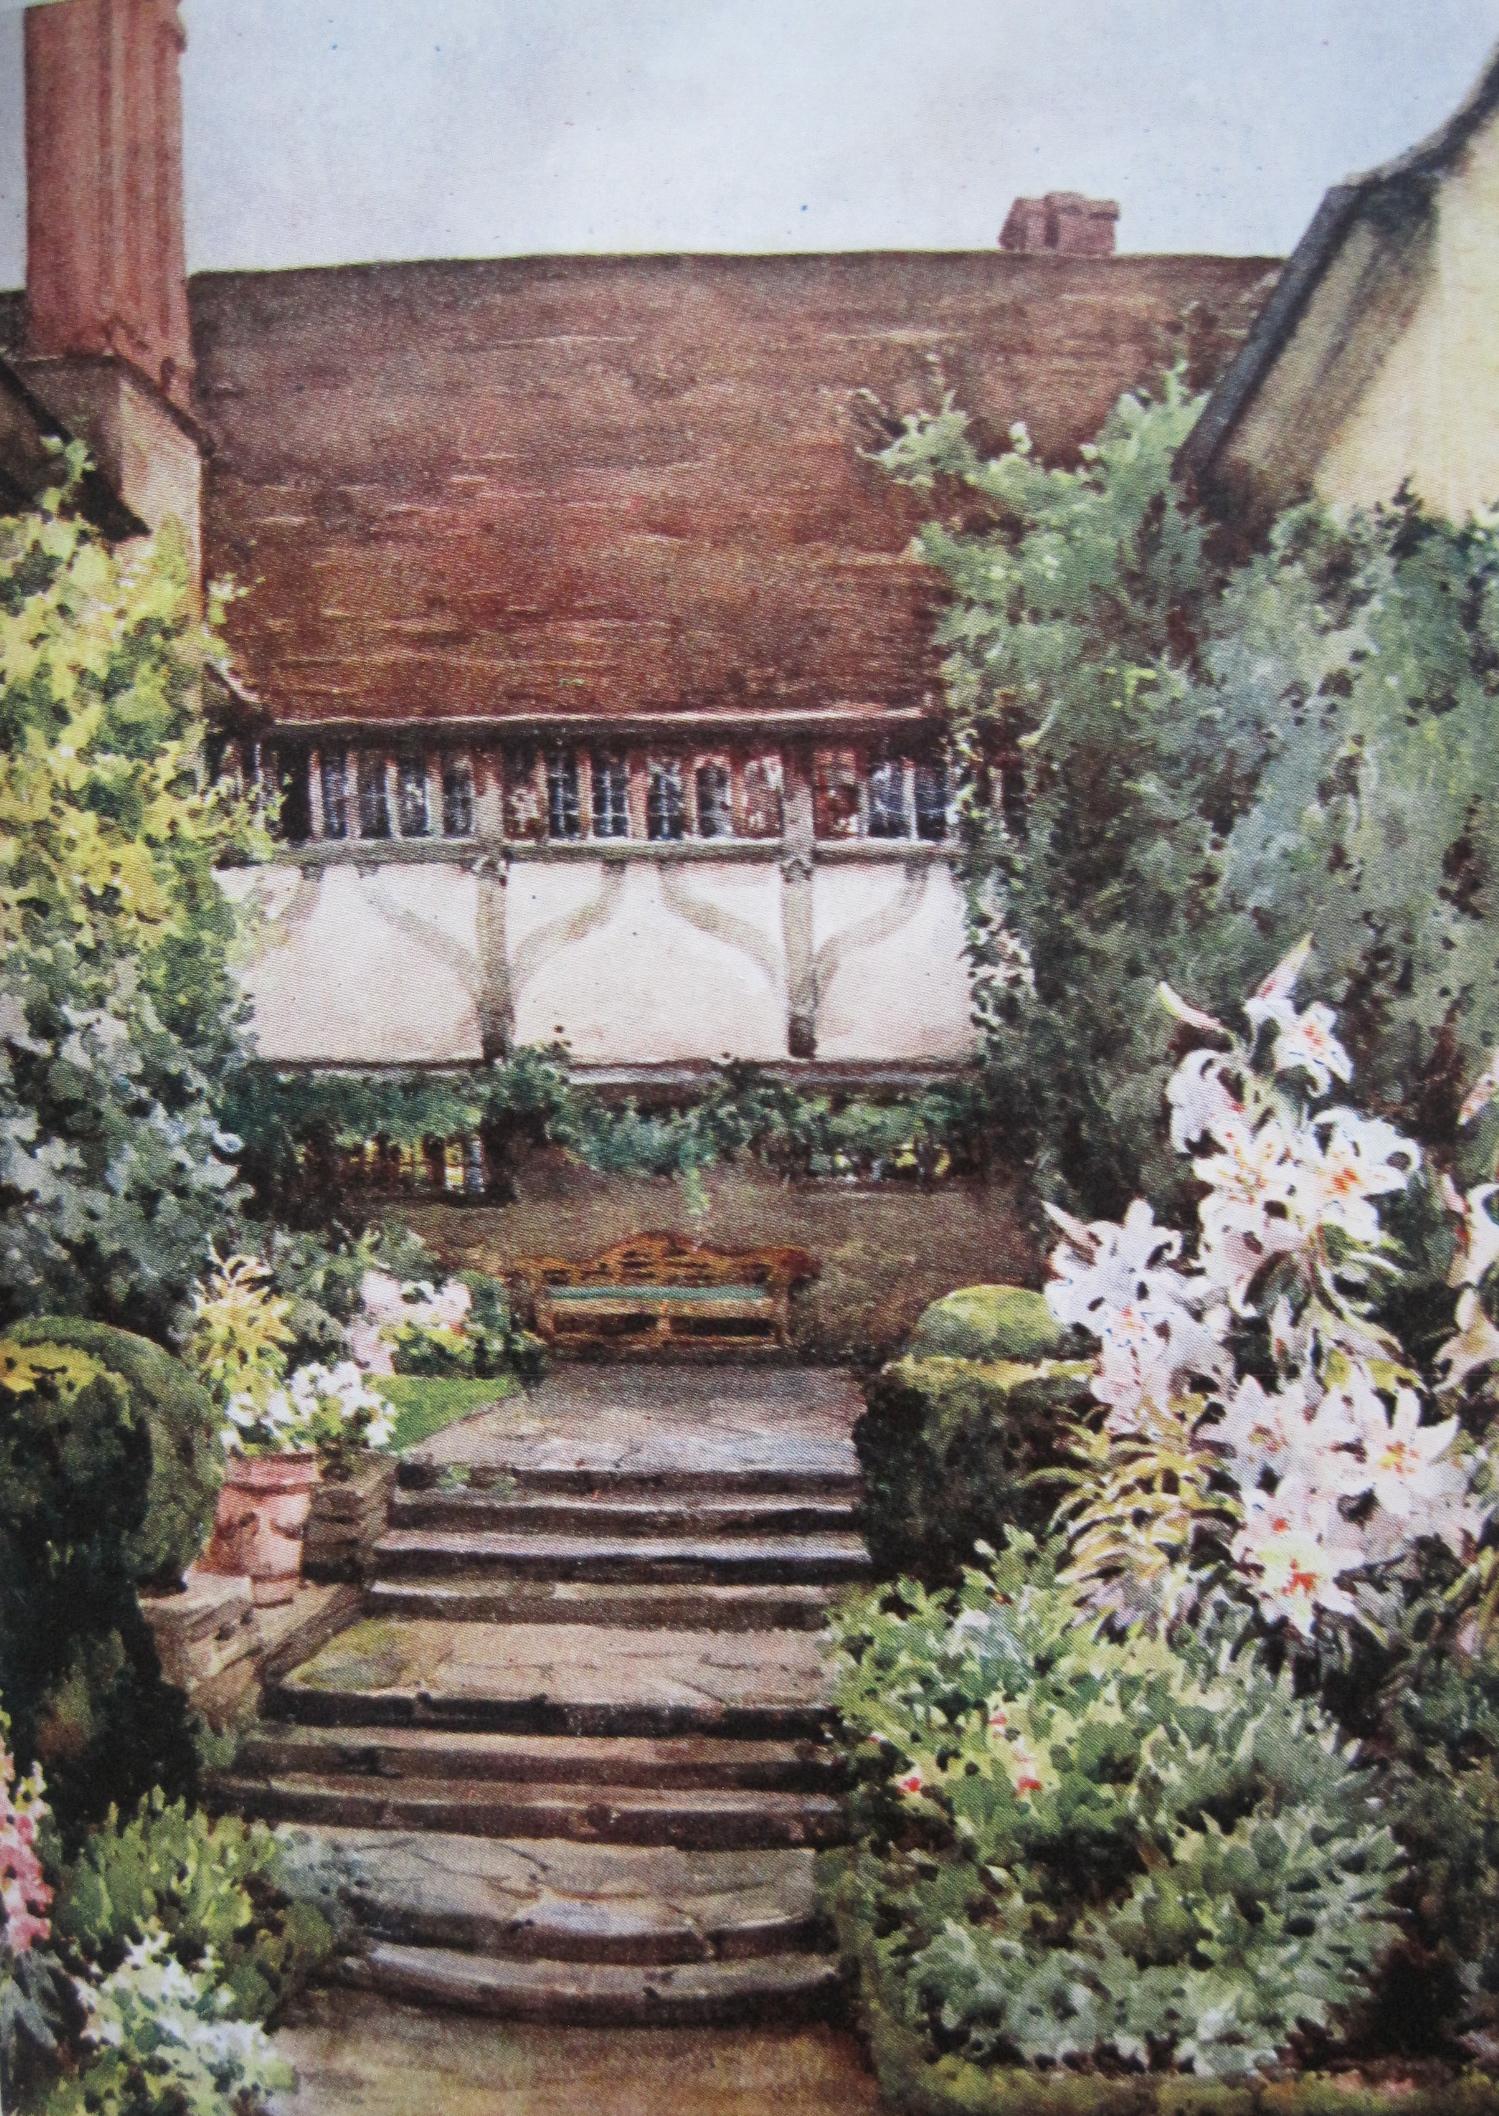 Gertrude Jekyll Artist Craftswoman And Gardener 18th